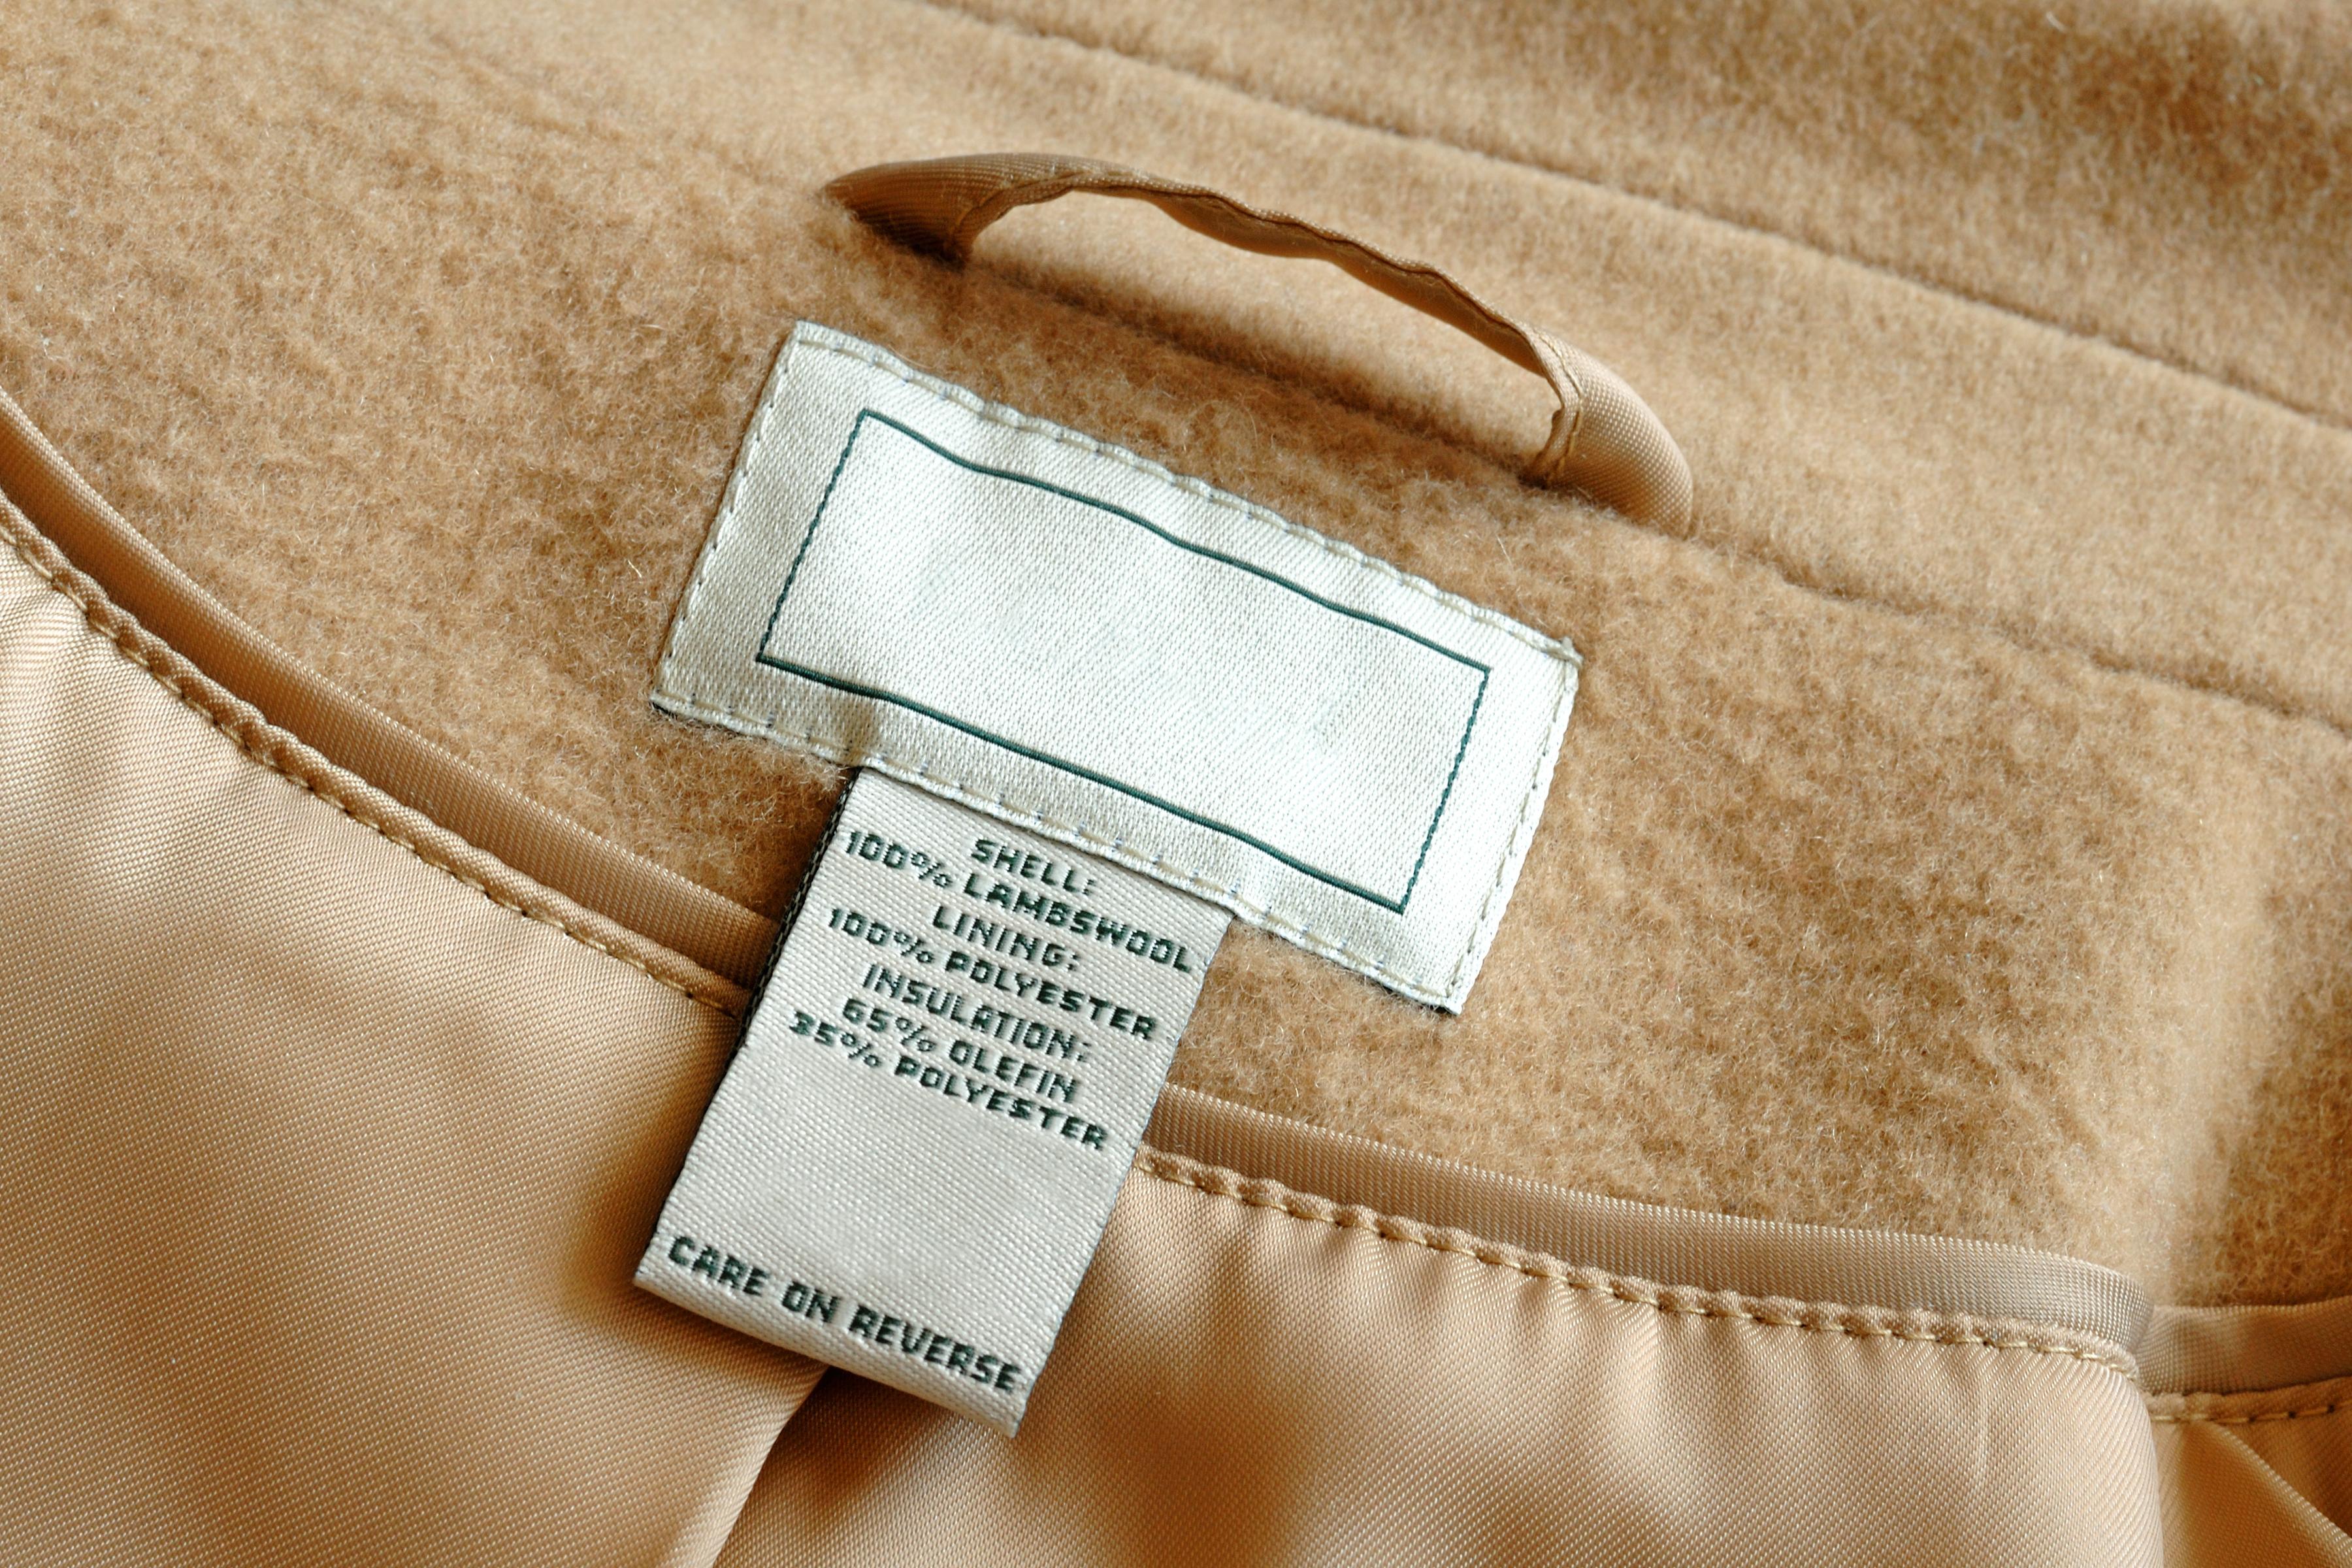 Custom made labels